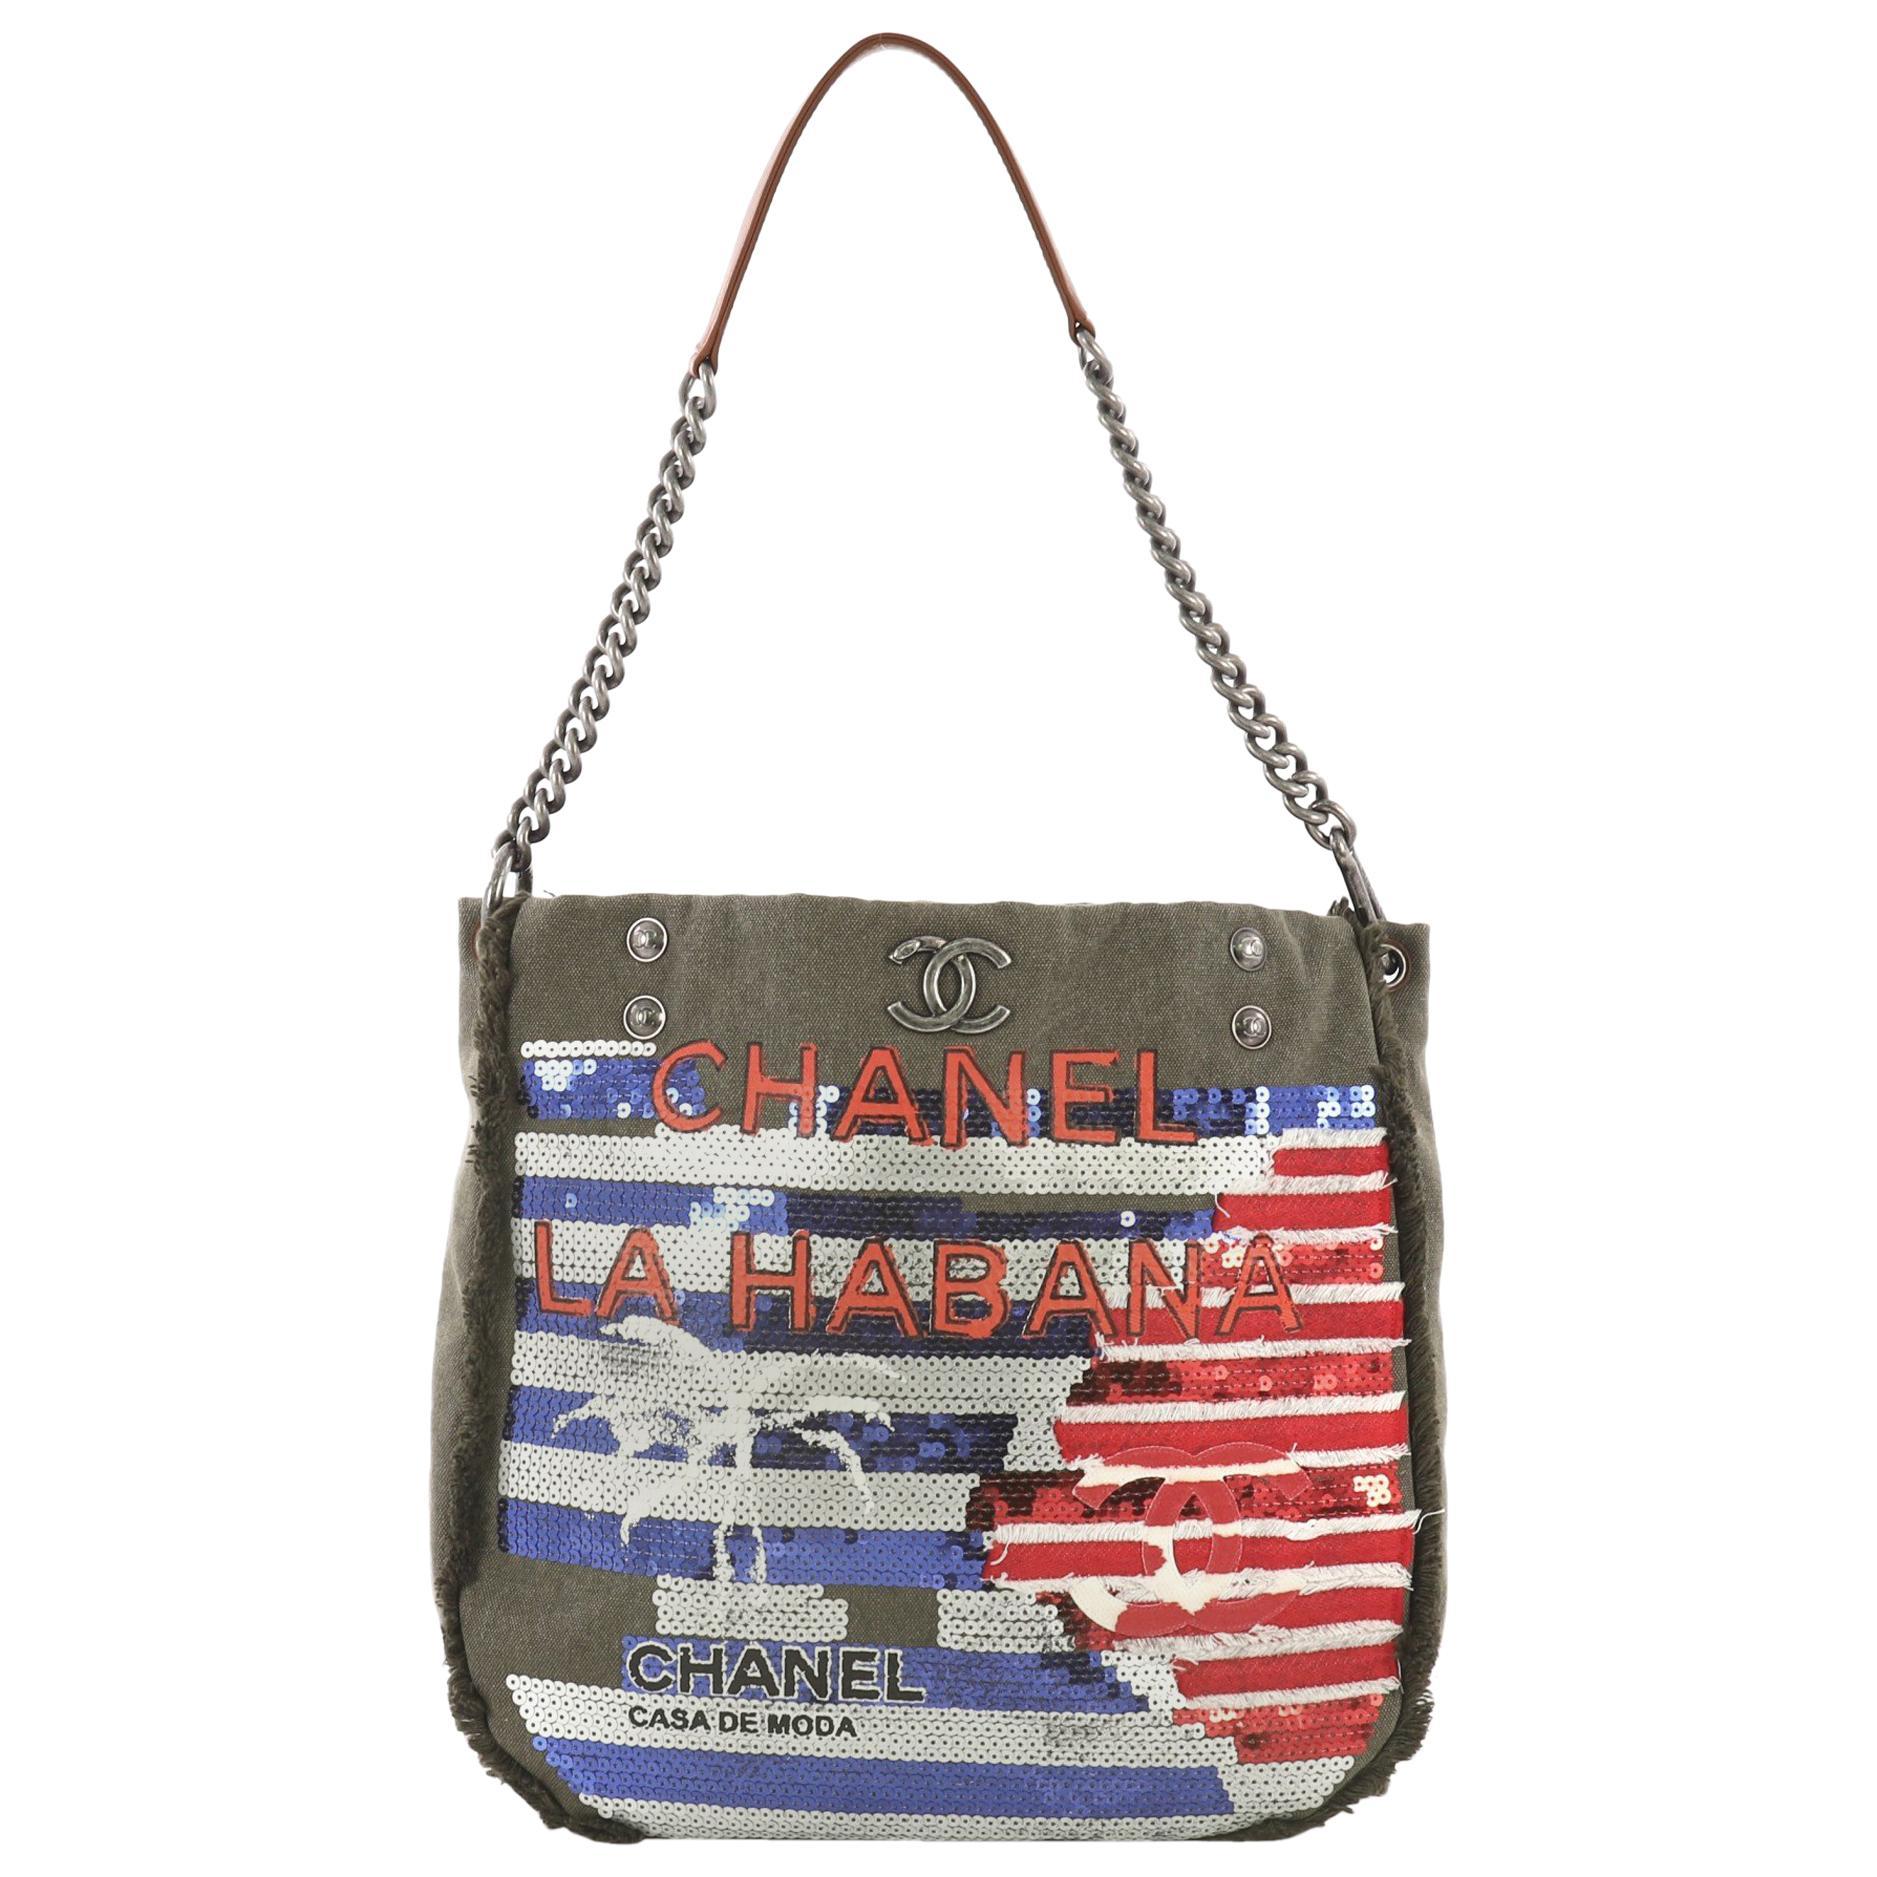 44ca67ef765a Sequin Handbags - 70 For Sale on 1stdibs